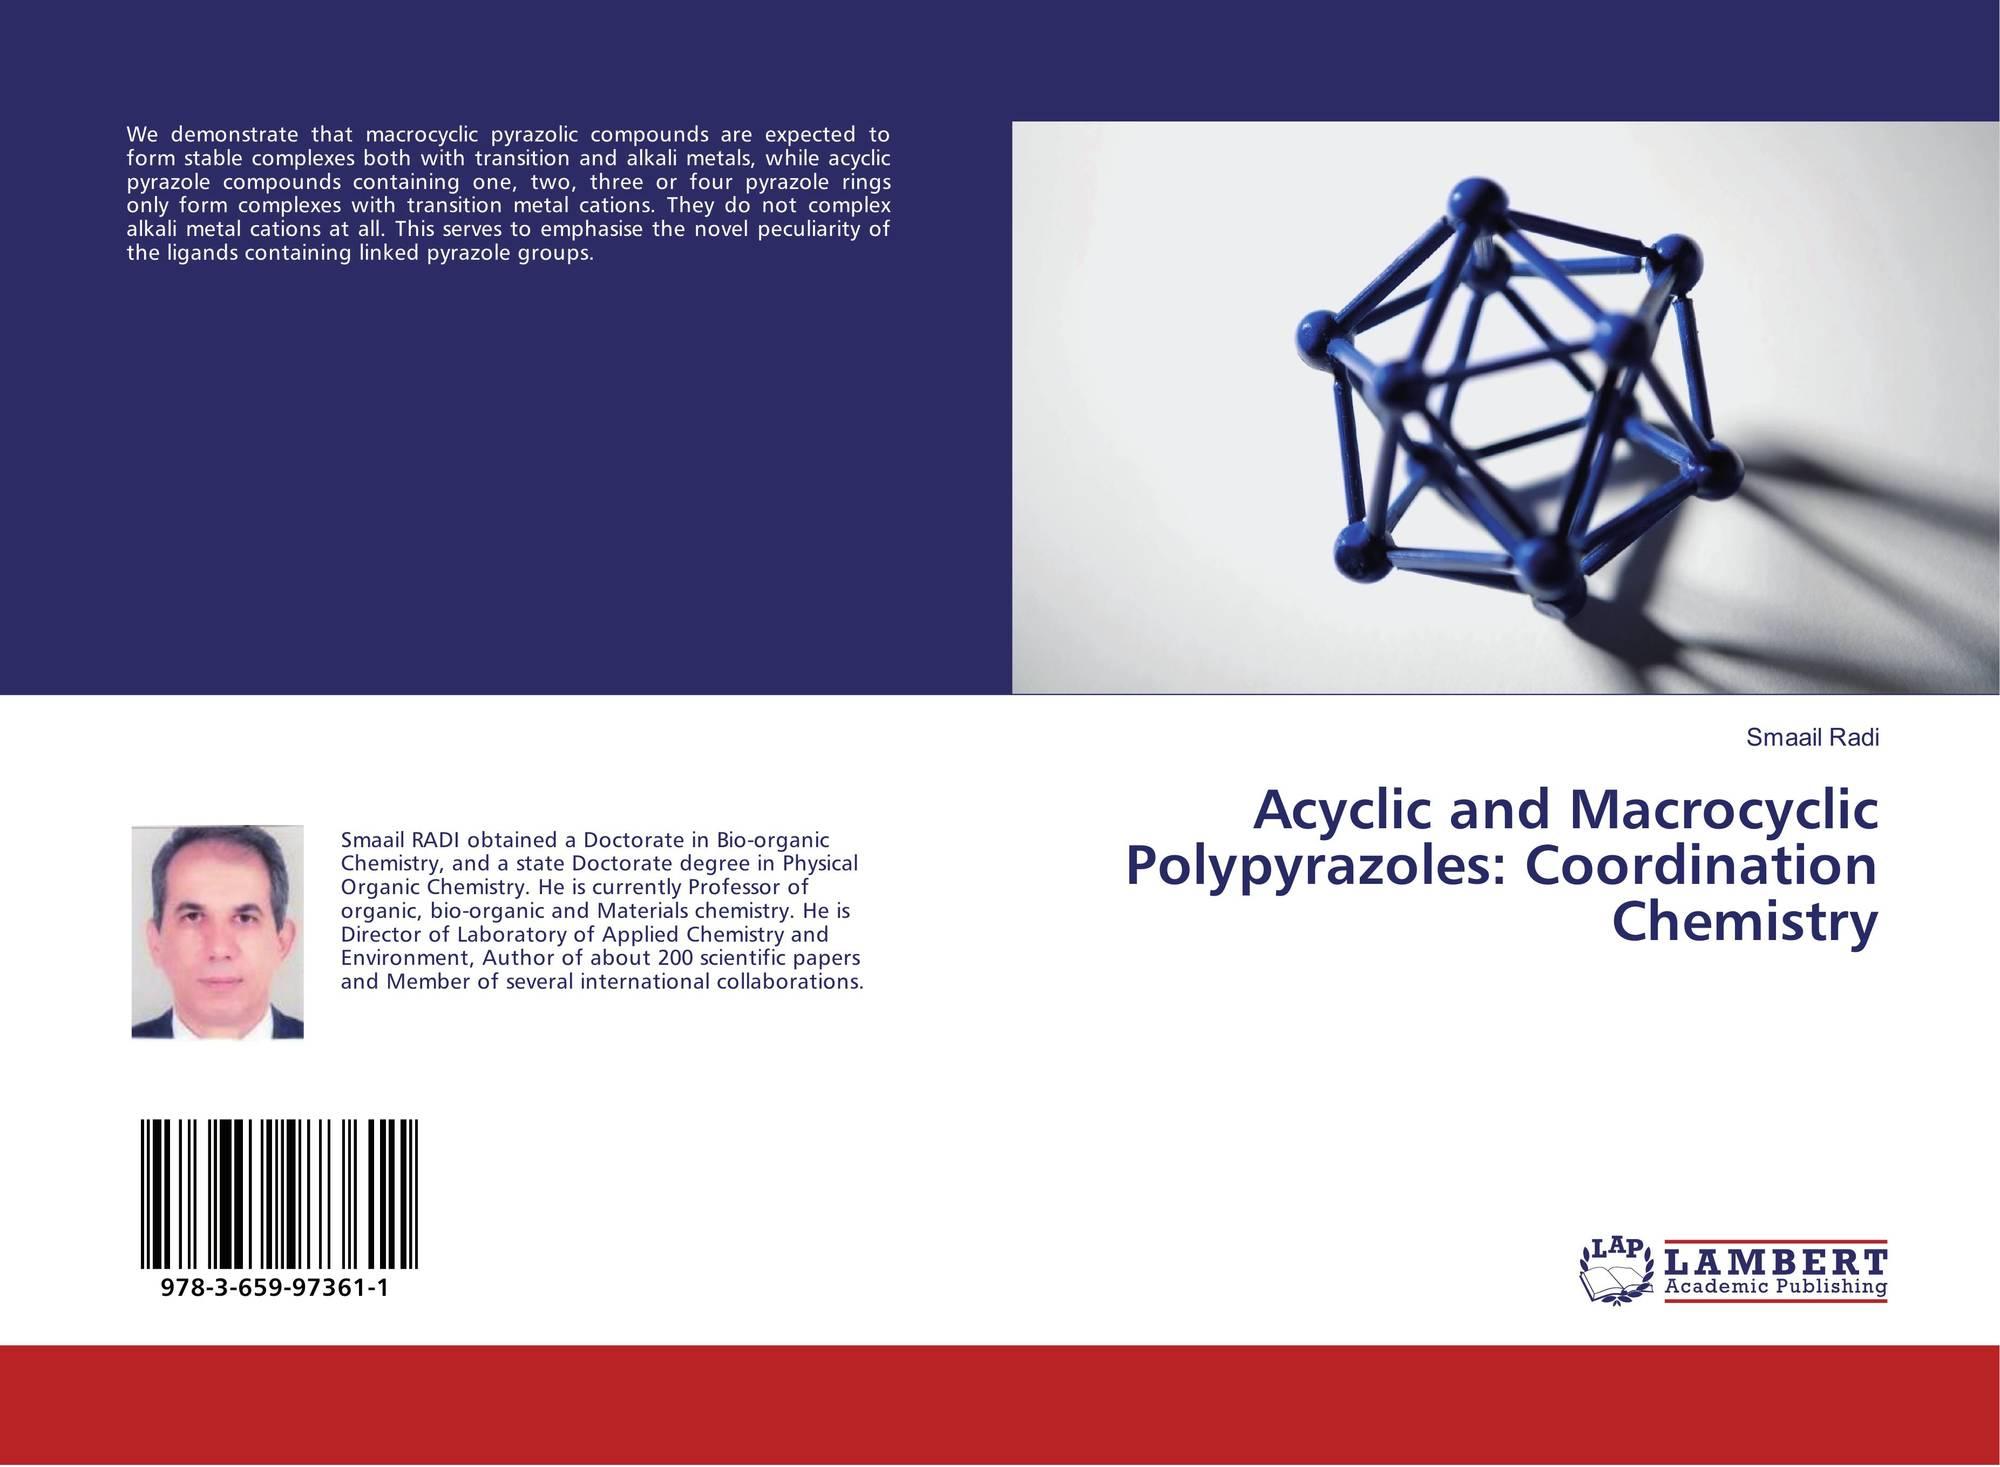 Acyclic and Macrocyclic Polypyrazoles: Coordination